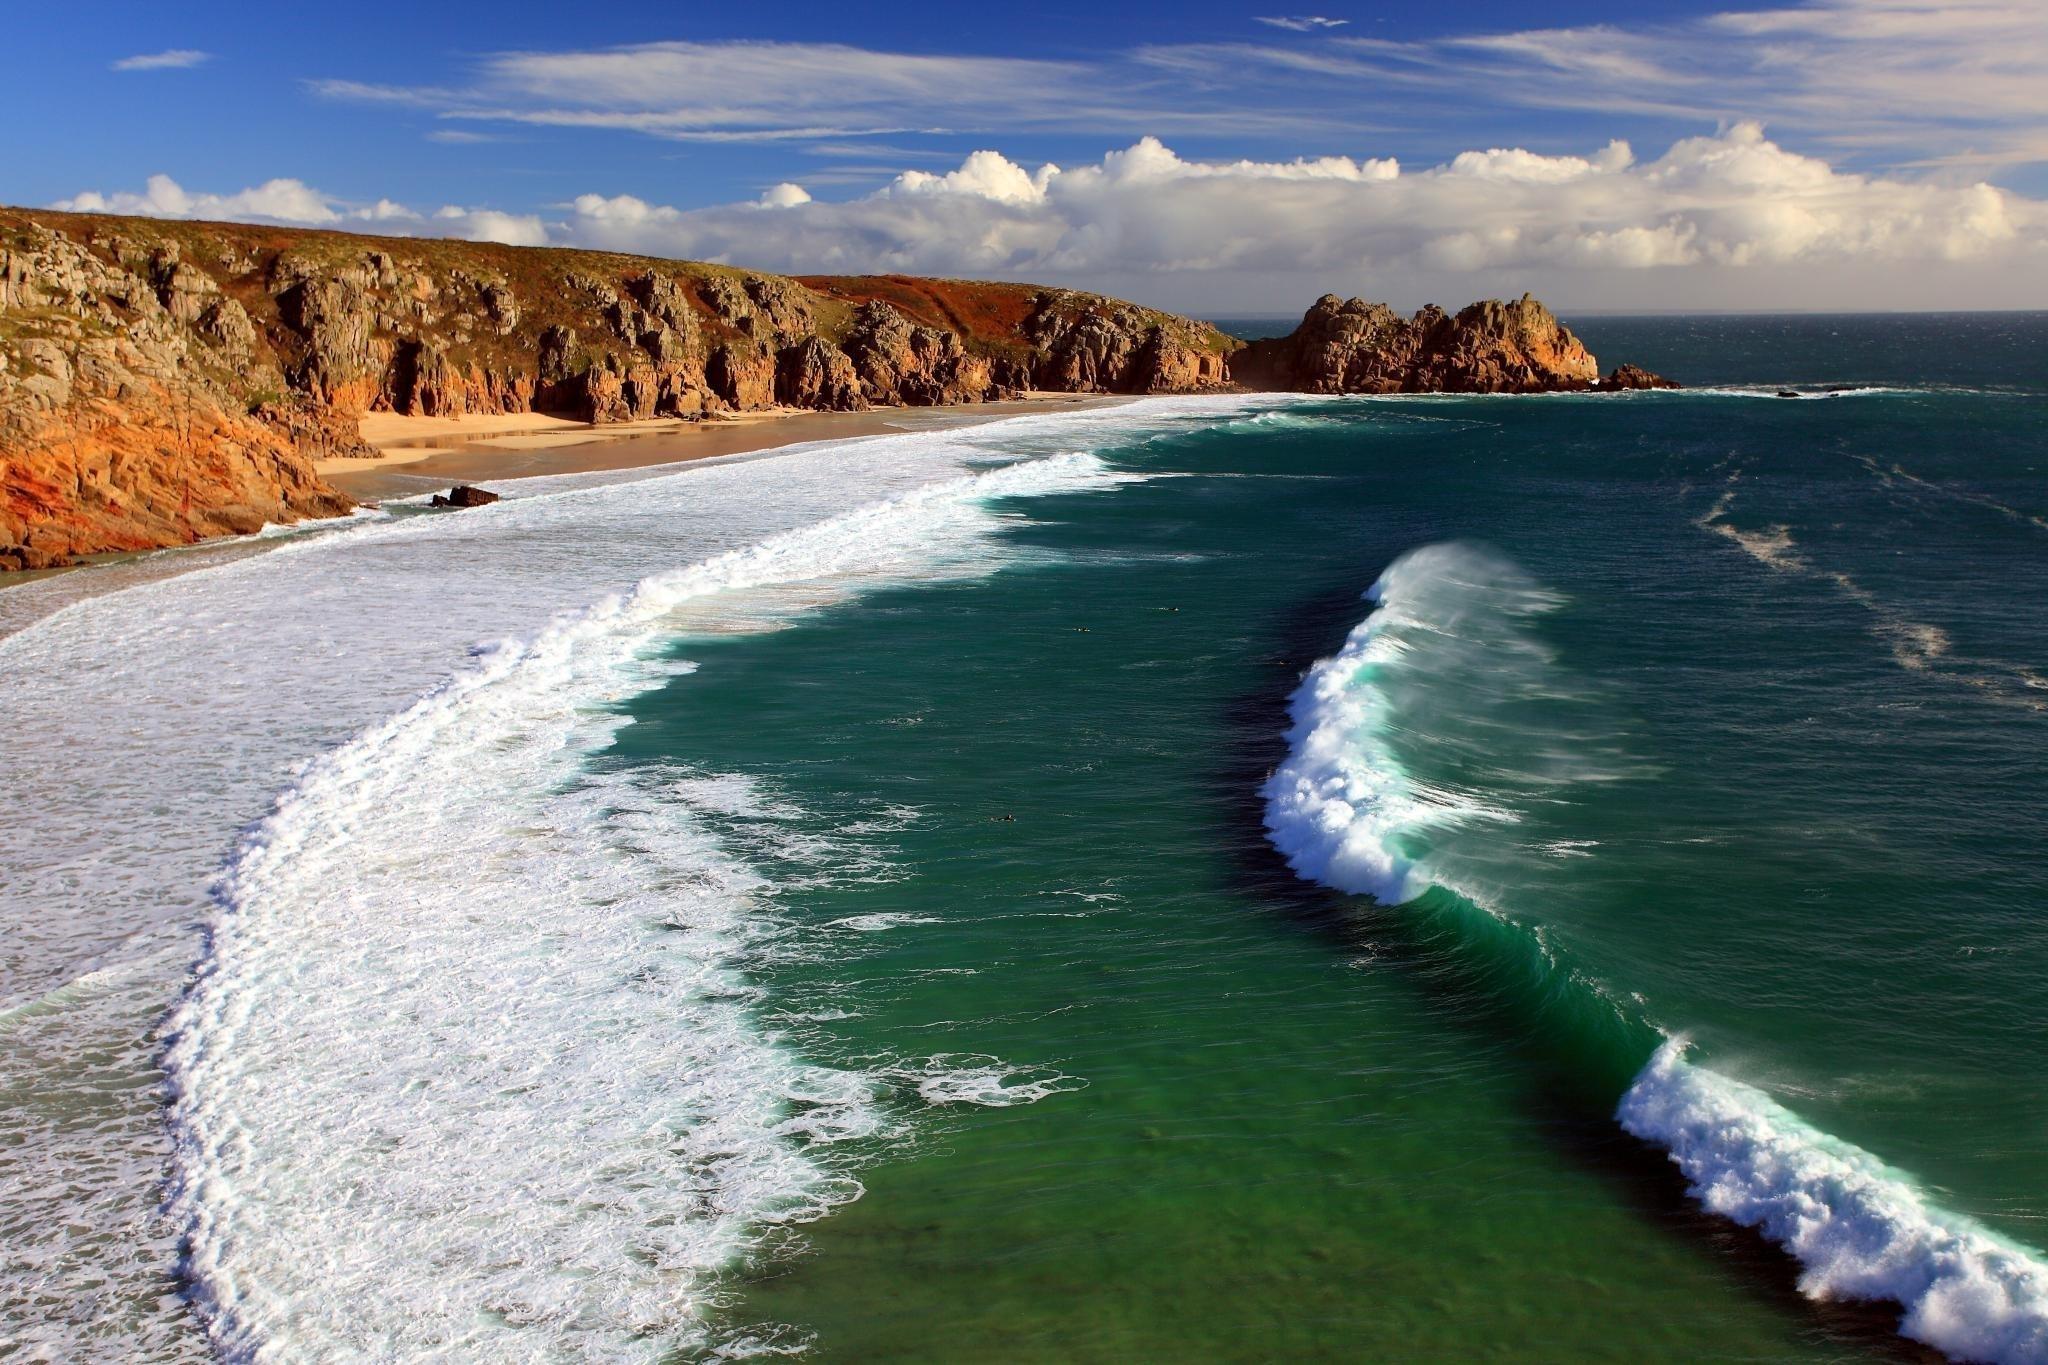 берег море shore sea  № 45697 загрузить